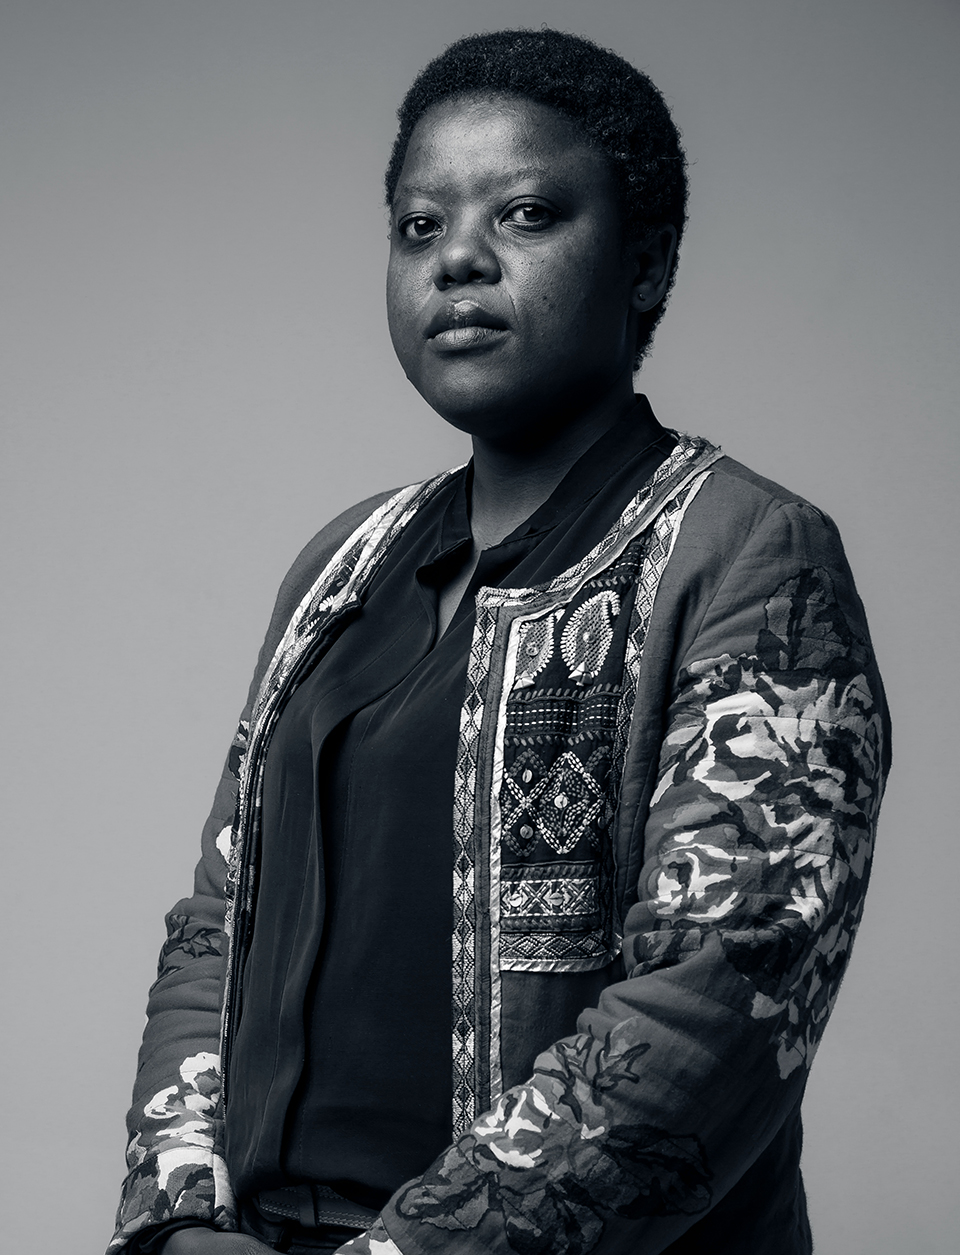 Khona Dlamini